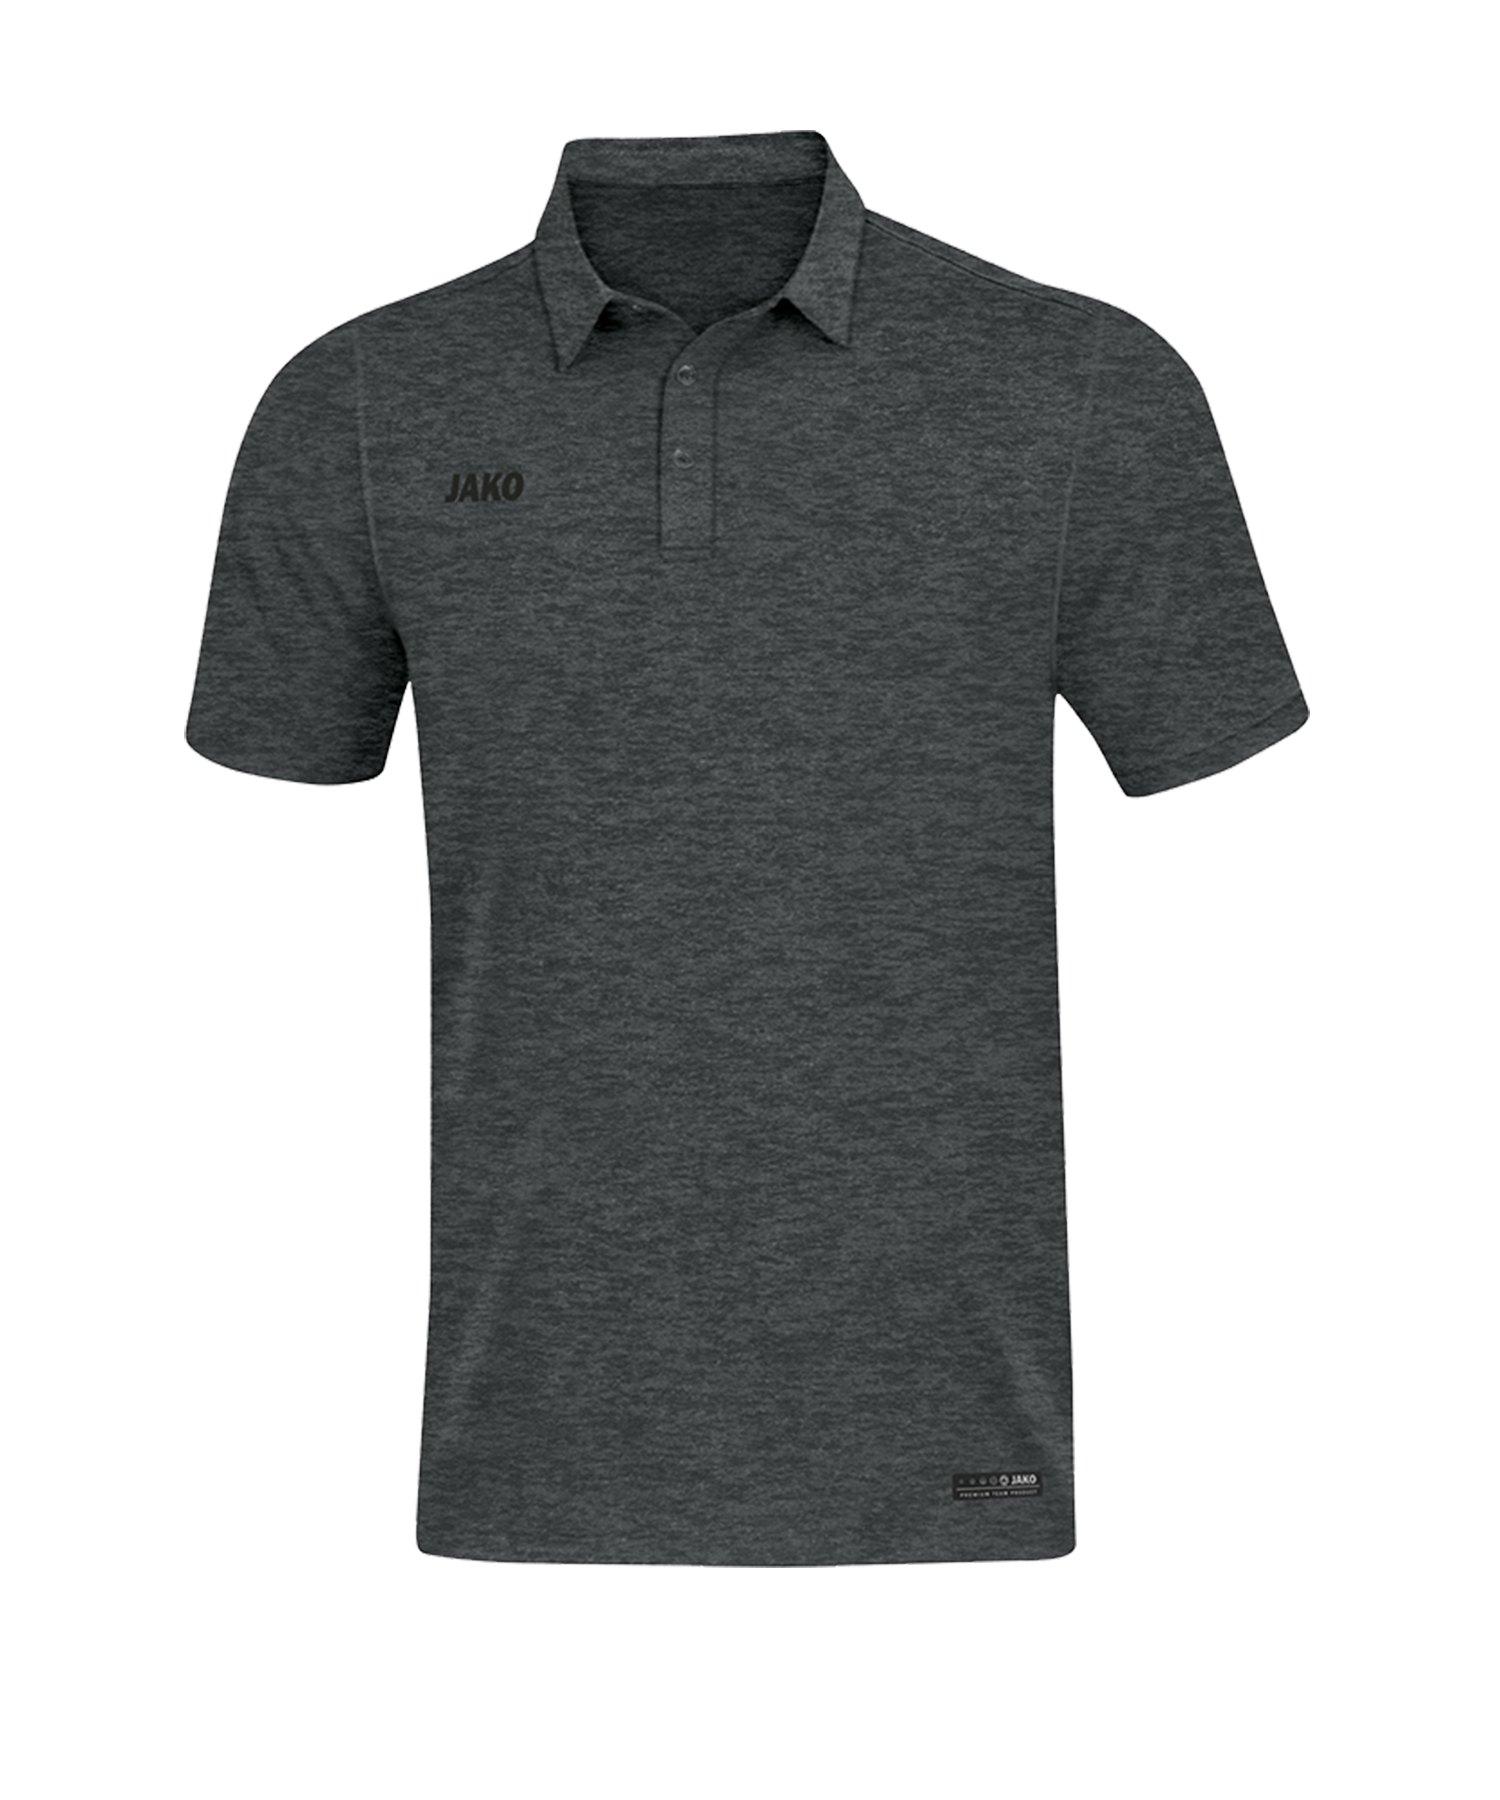 Jako Premium Basics Poloshirt Grau F21 - Grau